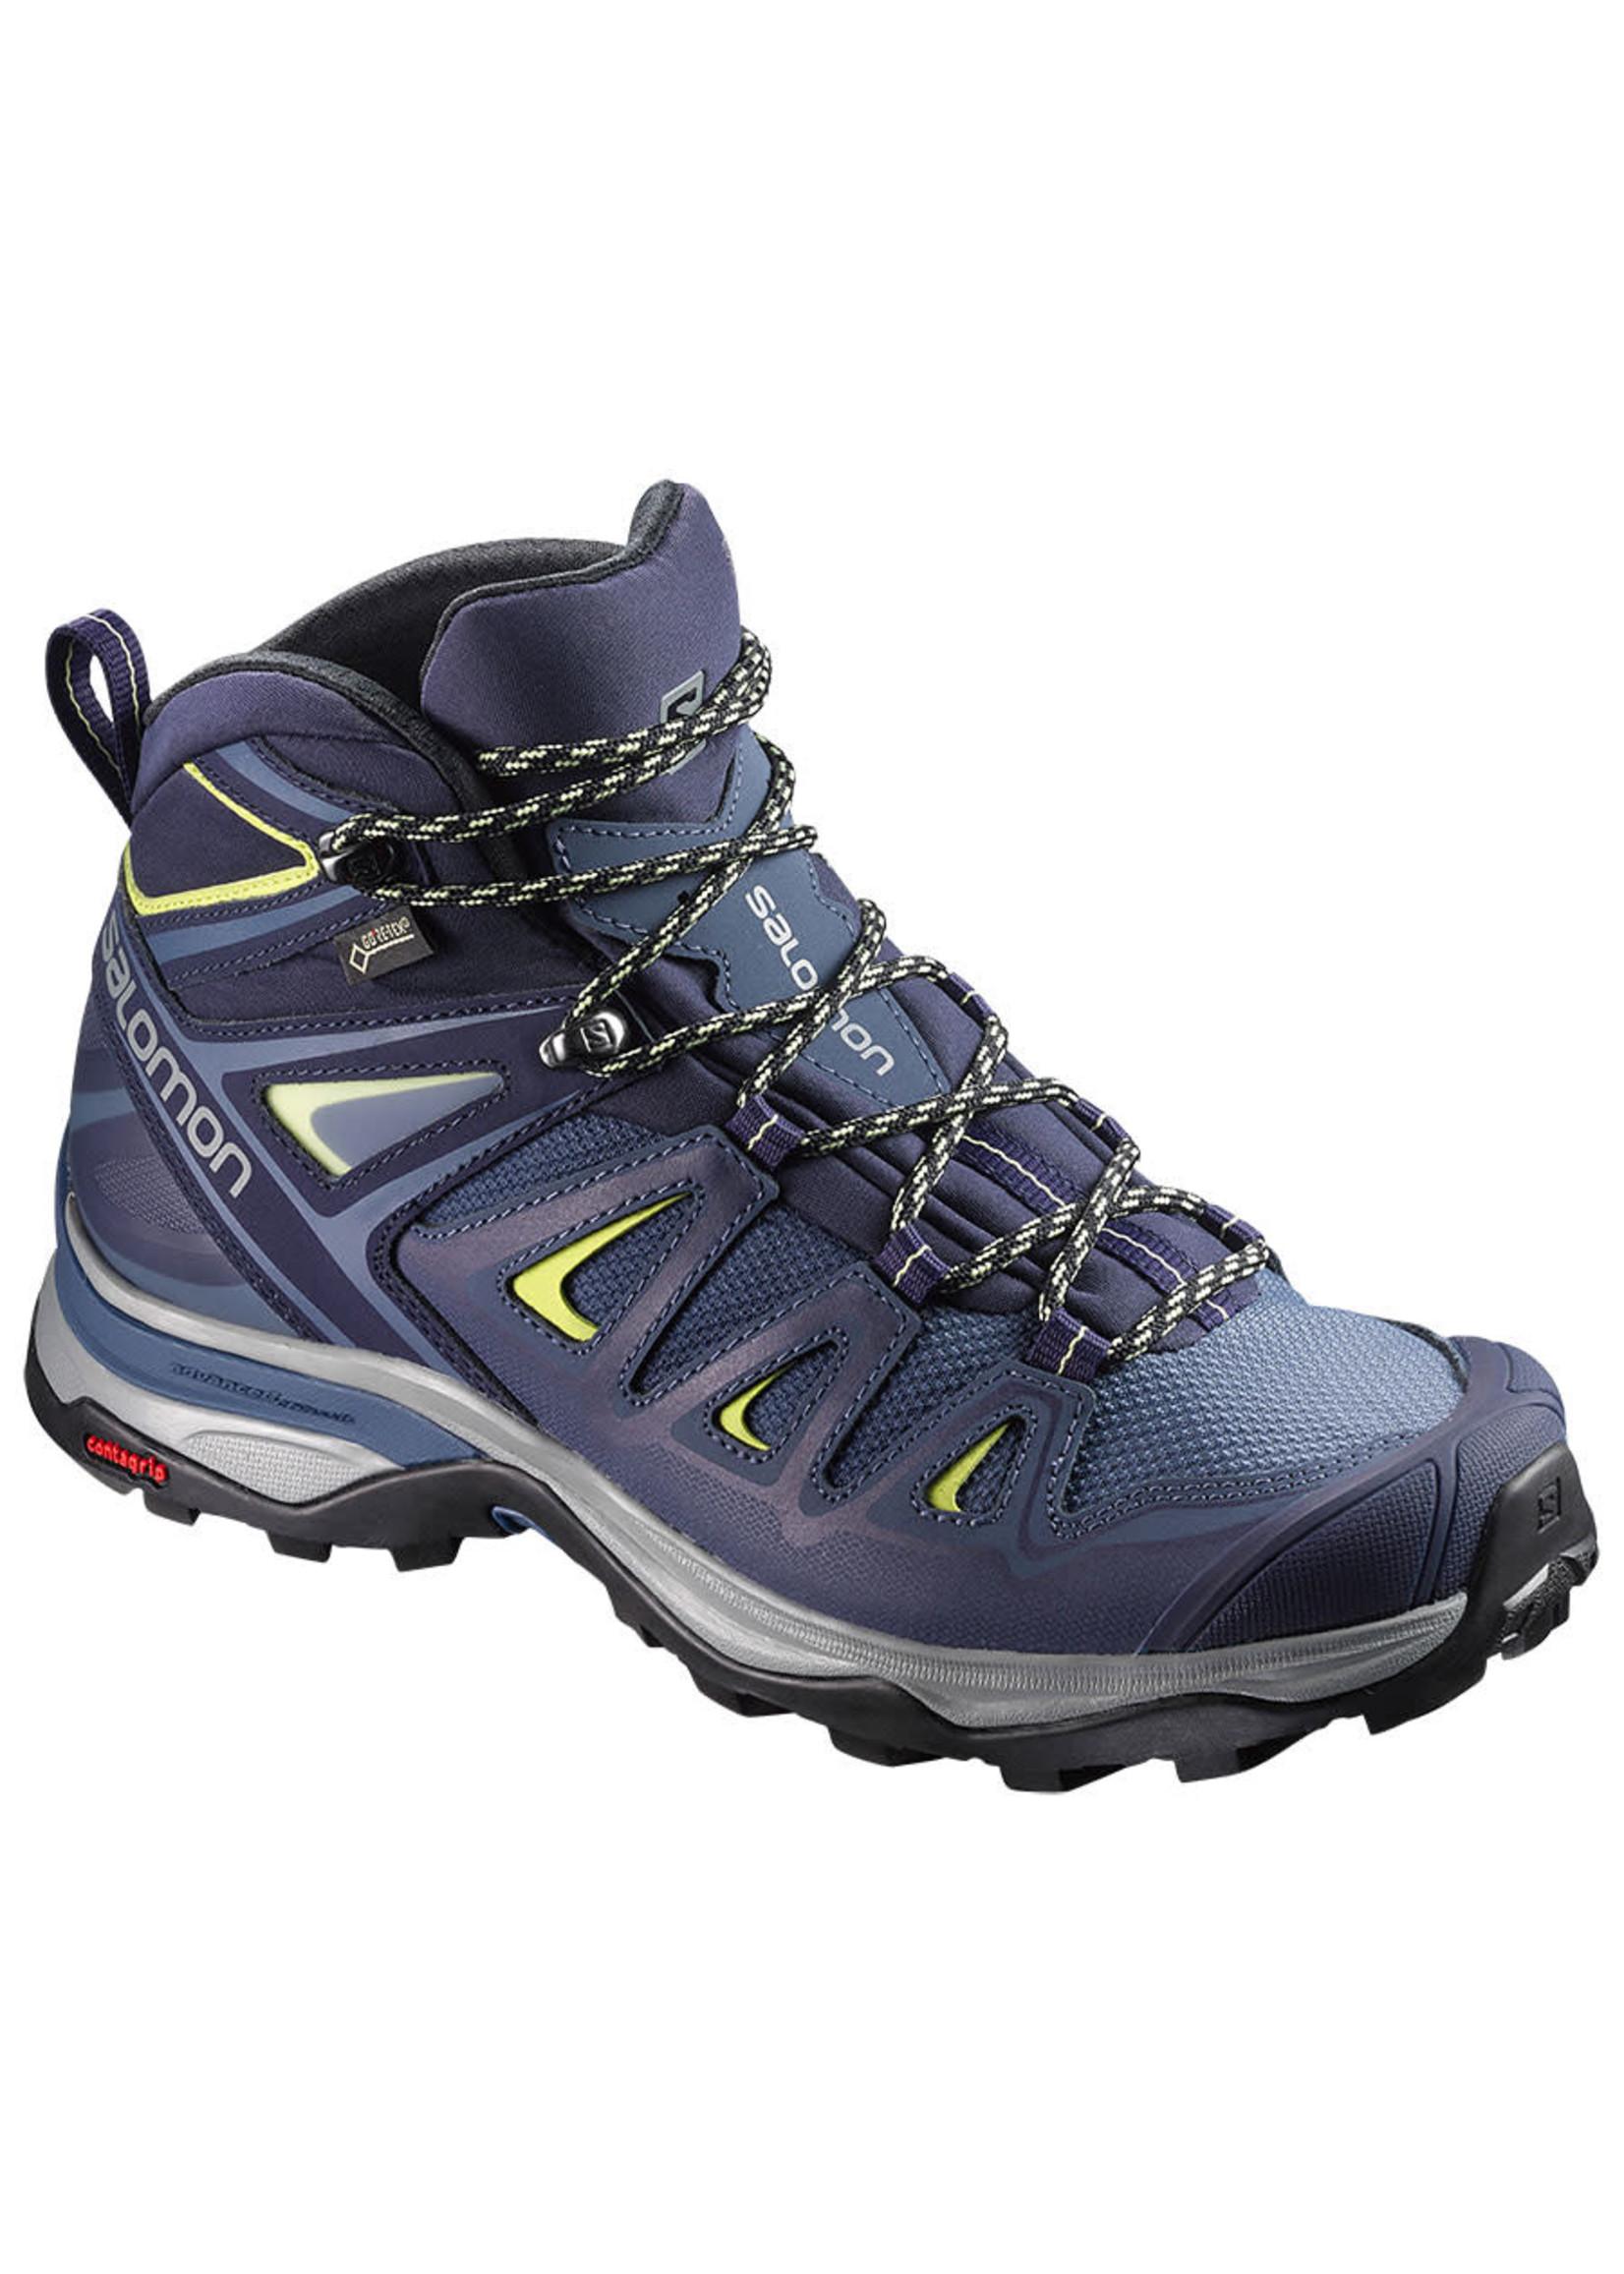 Salomon Salomon X Ultra 3 Mid GTX Ladies Trail Shoe (2019)